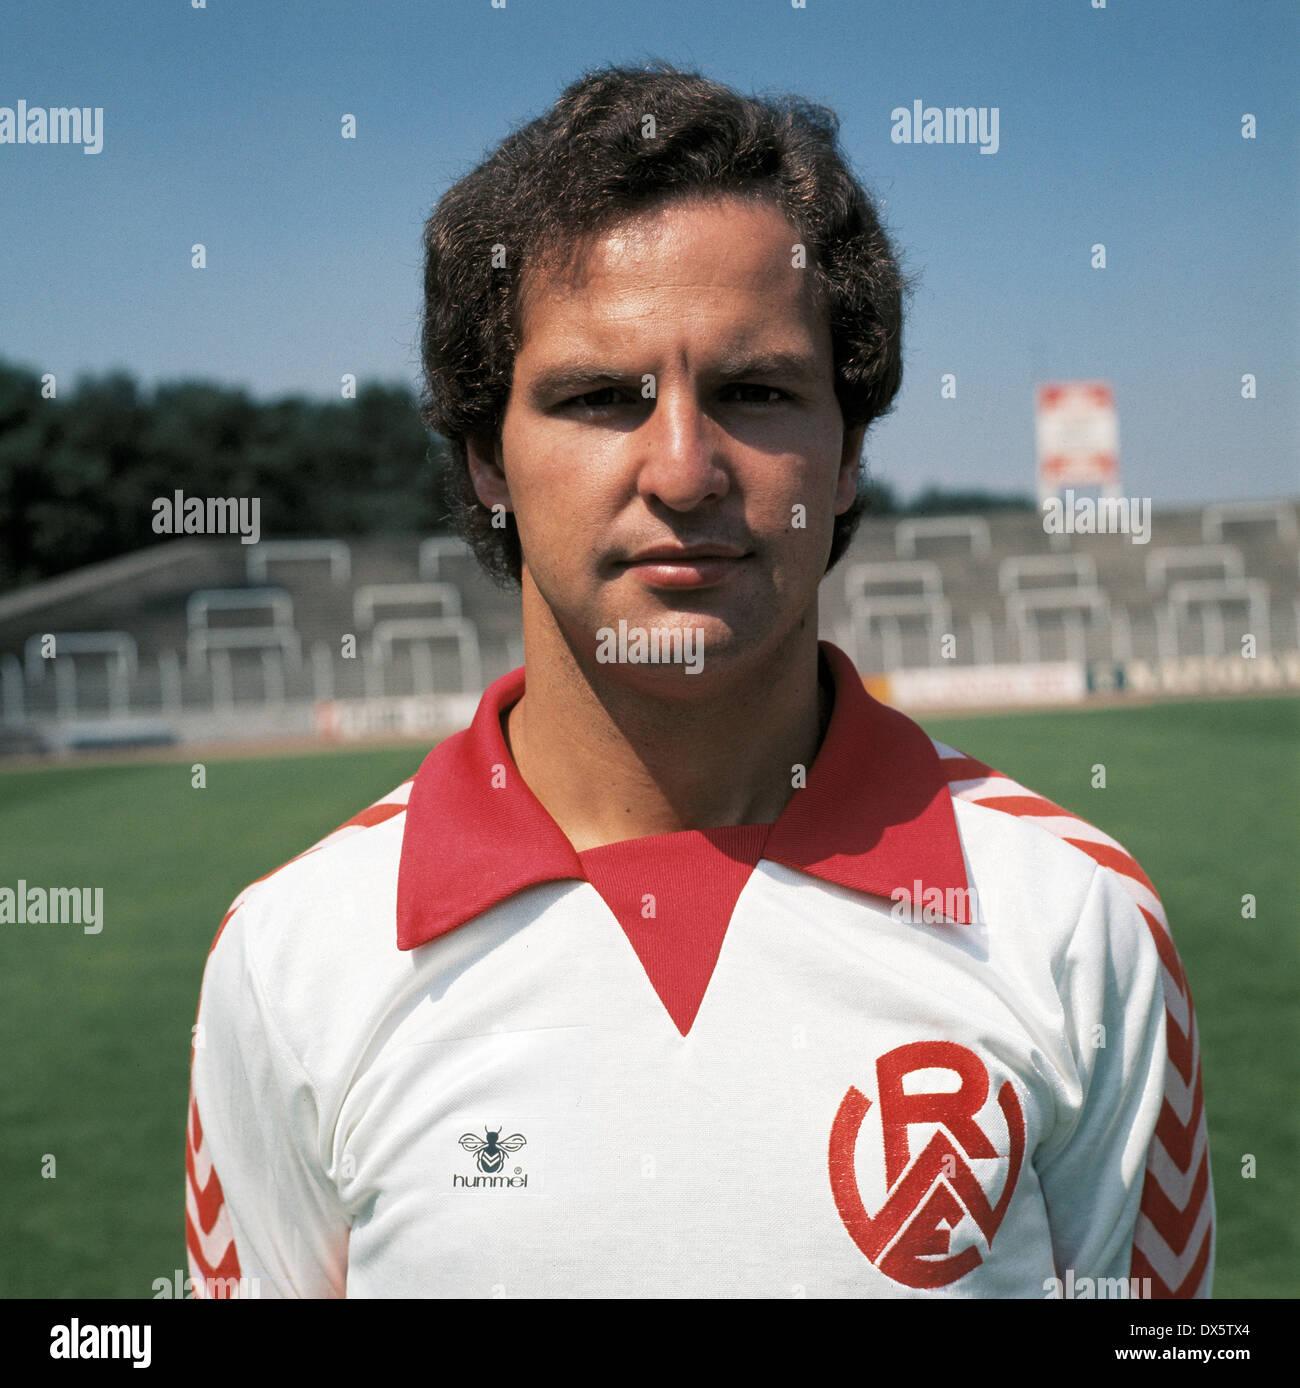 football, 2. Bundesliga Nord, 1977/1978, Rot Weiss Essen, team presentation, portrait Hartmut Huhse - Stock Image